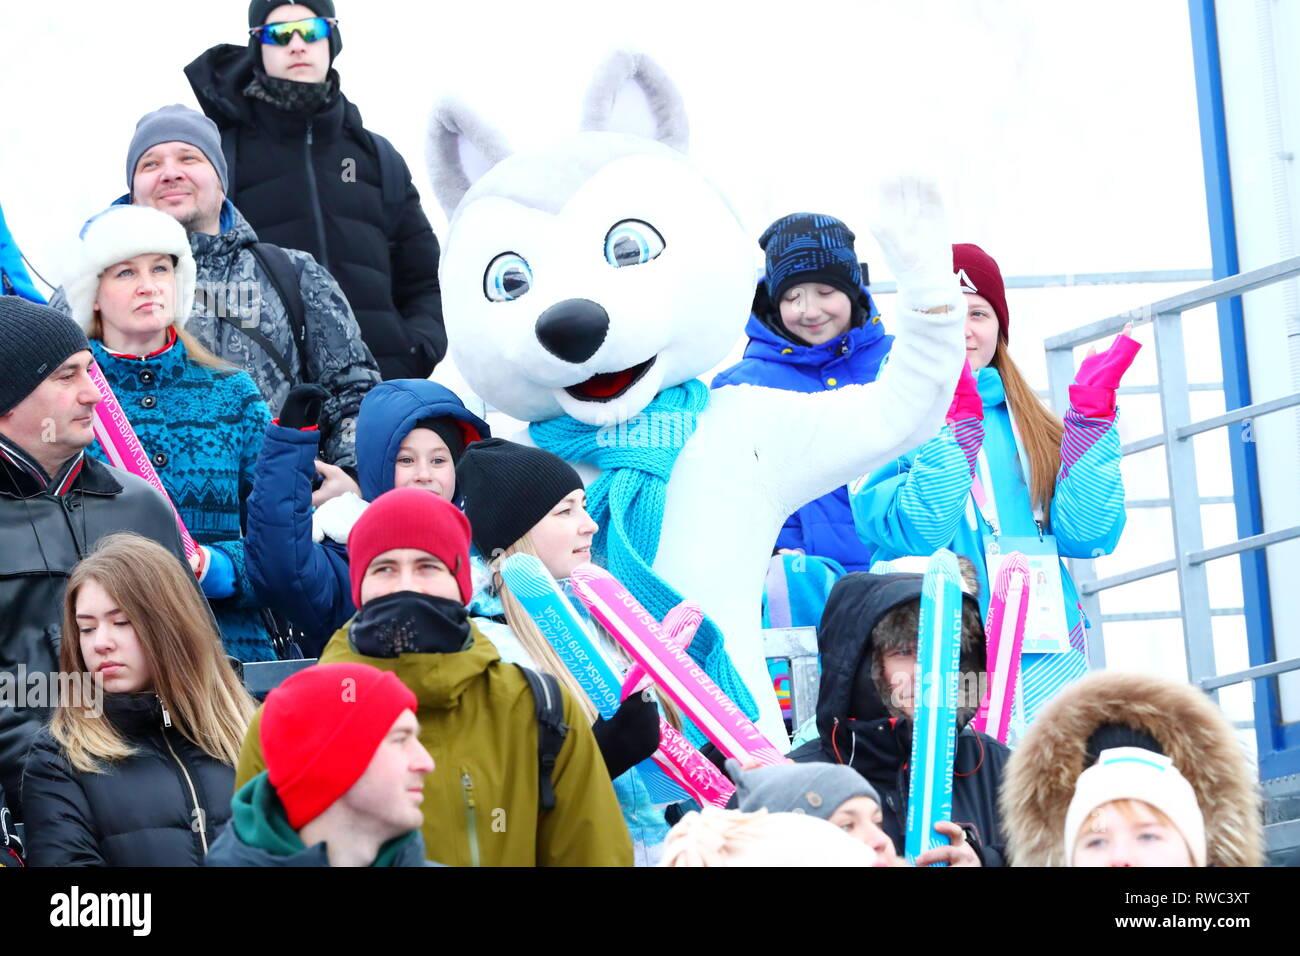 Sopka Cluster, Krasnoyarsk, Russia. 5th Mar, 2019. General view, MARCH 5, 2019 - Snowboarding : Parallel Giant Slalom during 29th Winter Universiade Krasnoyarsk 2019 at Sopka Cluster, Krasnoyarsk, Russia. Credit: Naoki Nishimura/AFLO SPORT/Alamy Live News Stock Photo